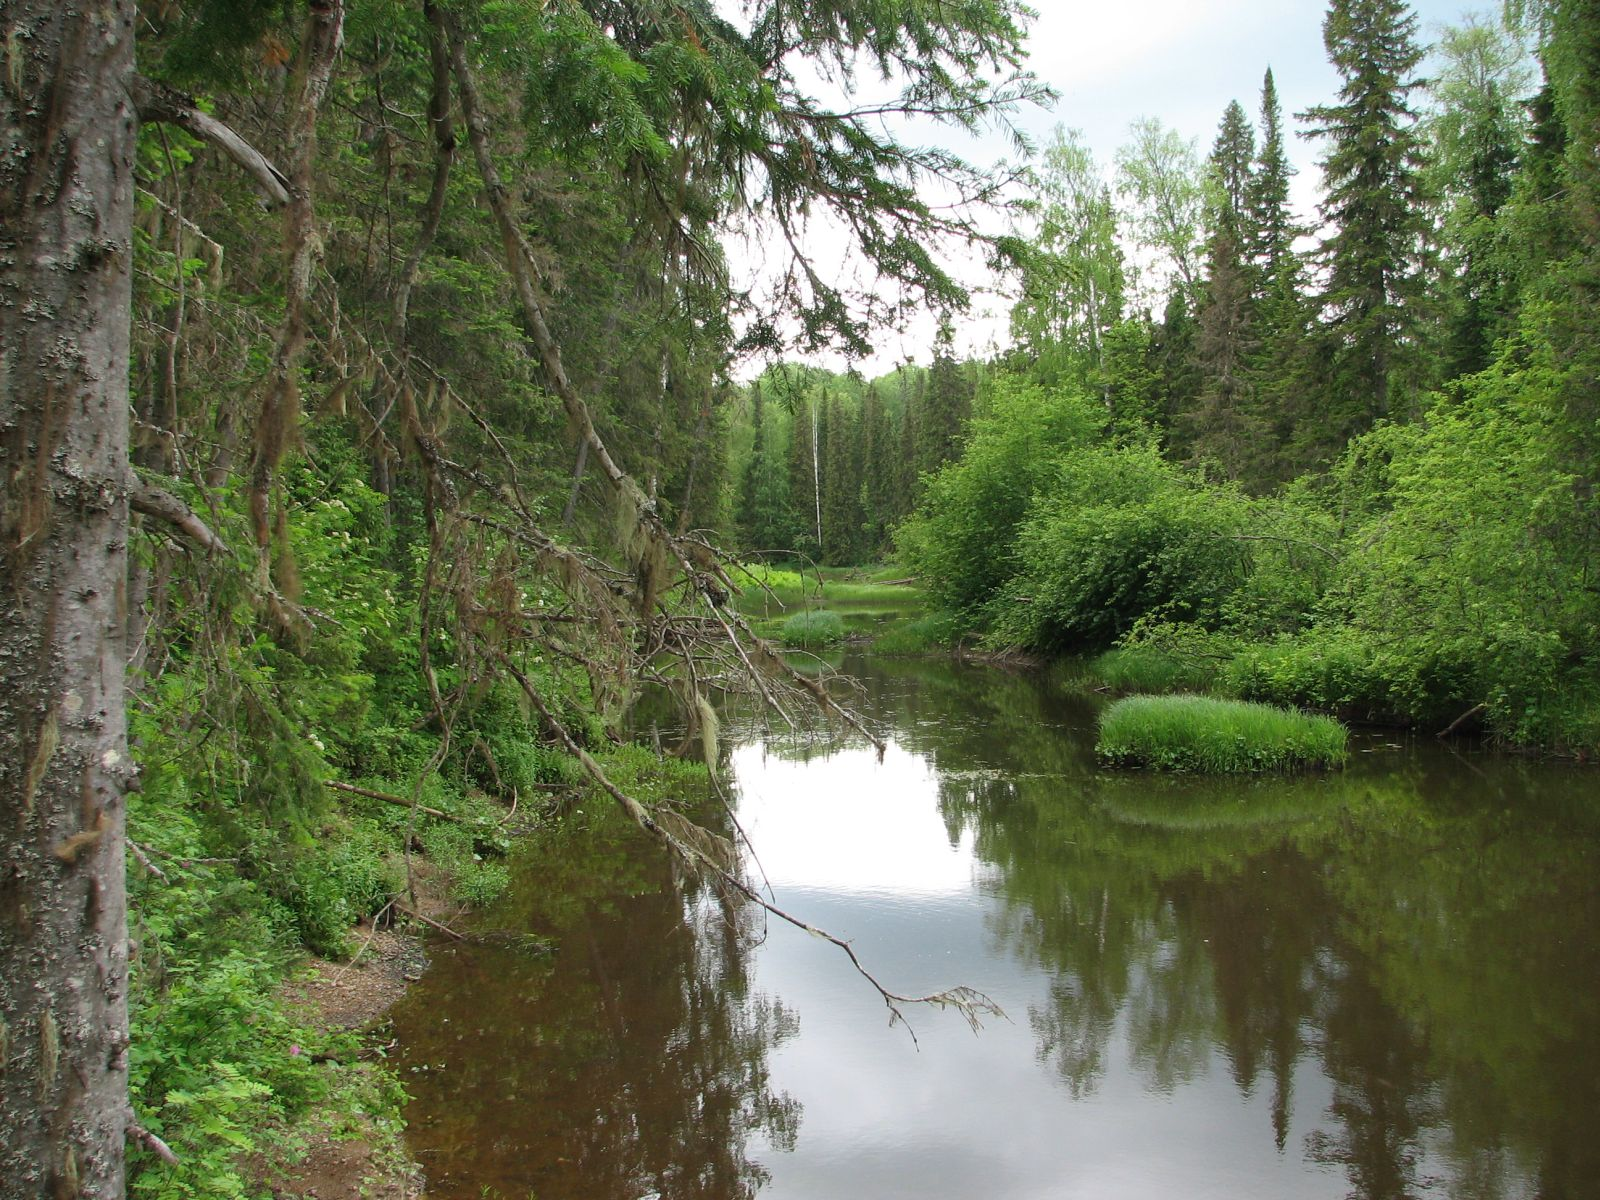 Река Федоровка в Тулашоре. Фото В. М. Рябова